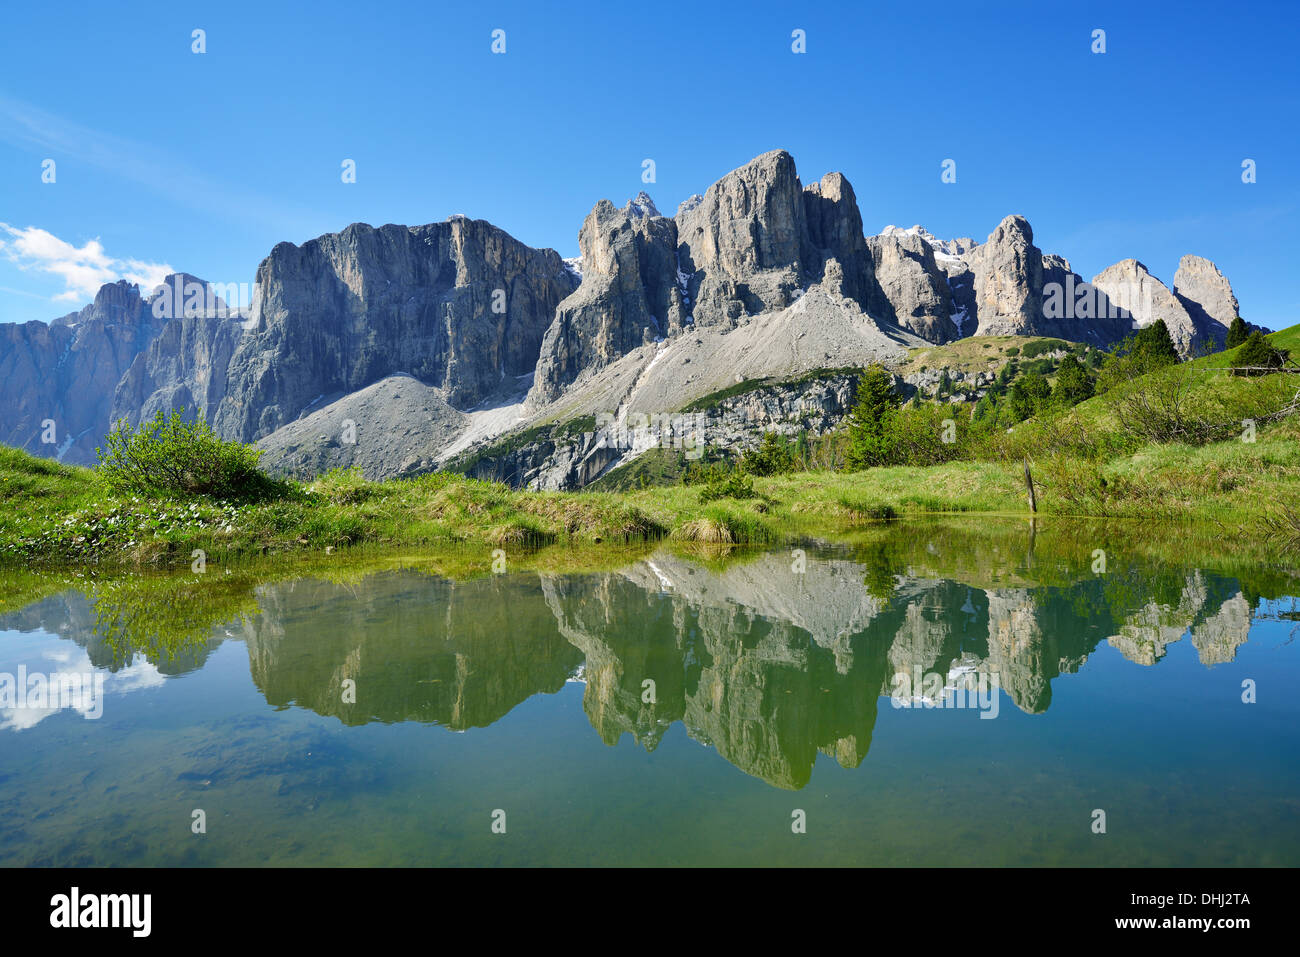 Sella range reflecting in a mountain lake, Sella, Dolomites, UNESCO world heritage site Dolomites, South Tyrol, Stock Photo